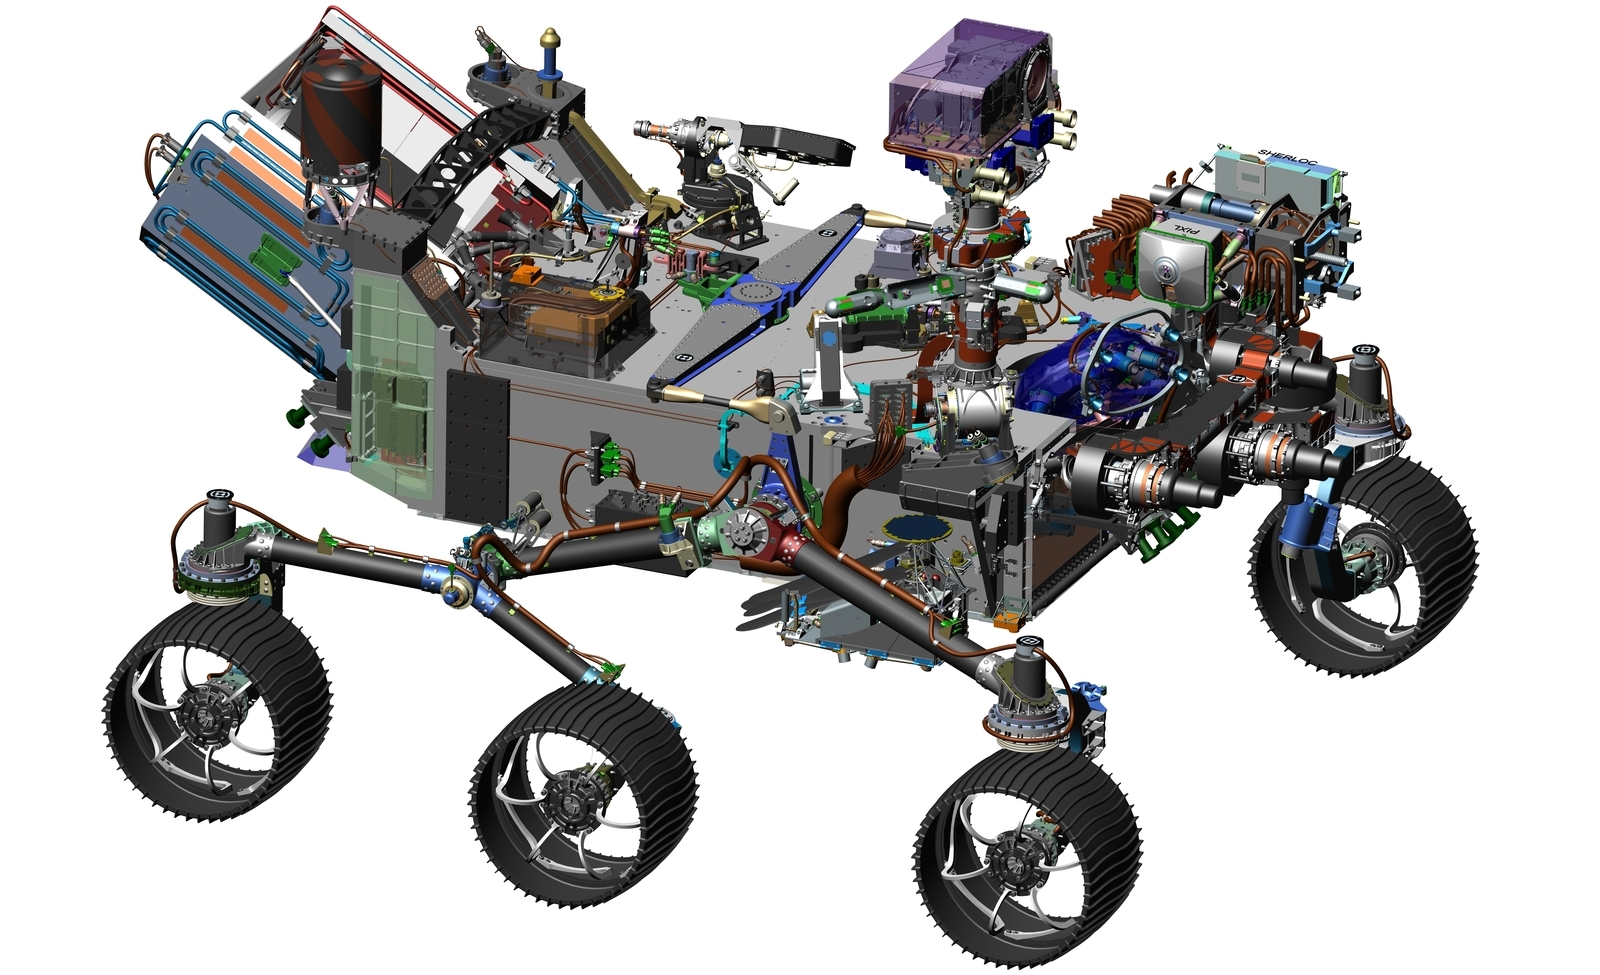 bpc_mars2020-rover-cad-pia20759.jpg